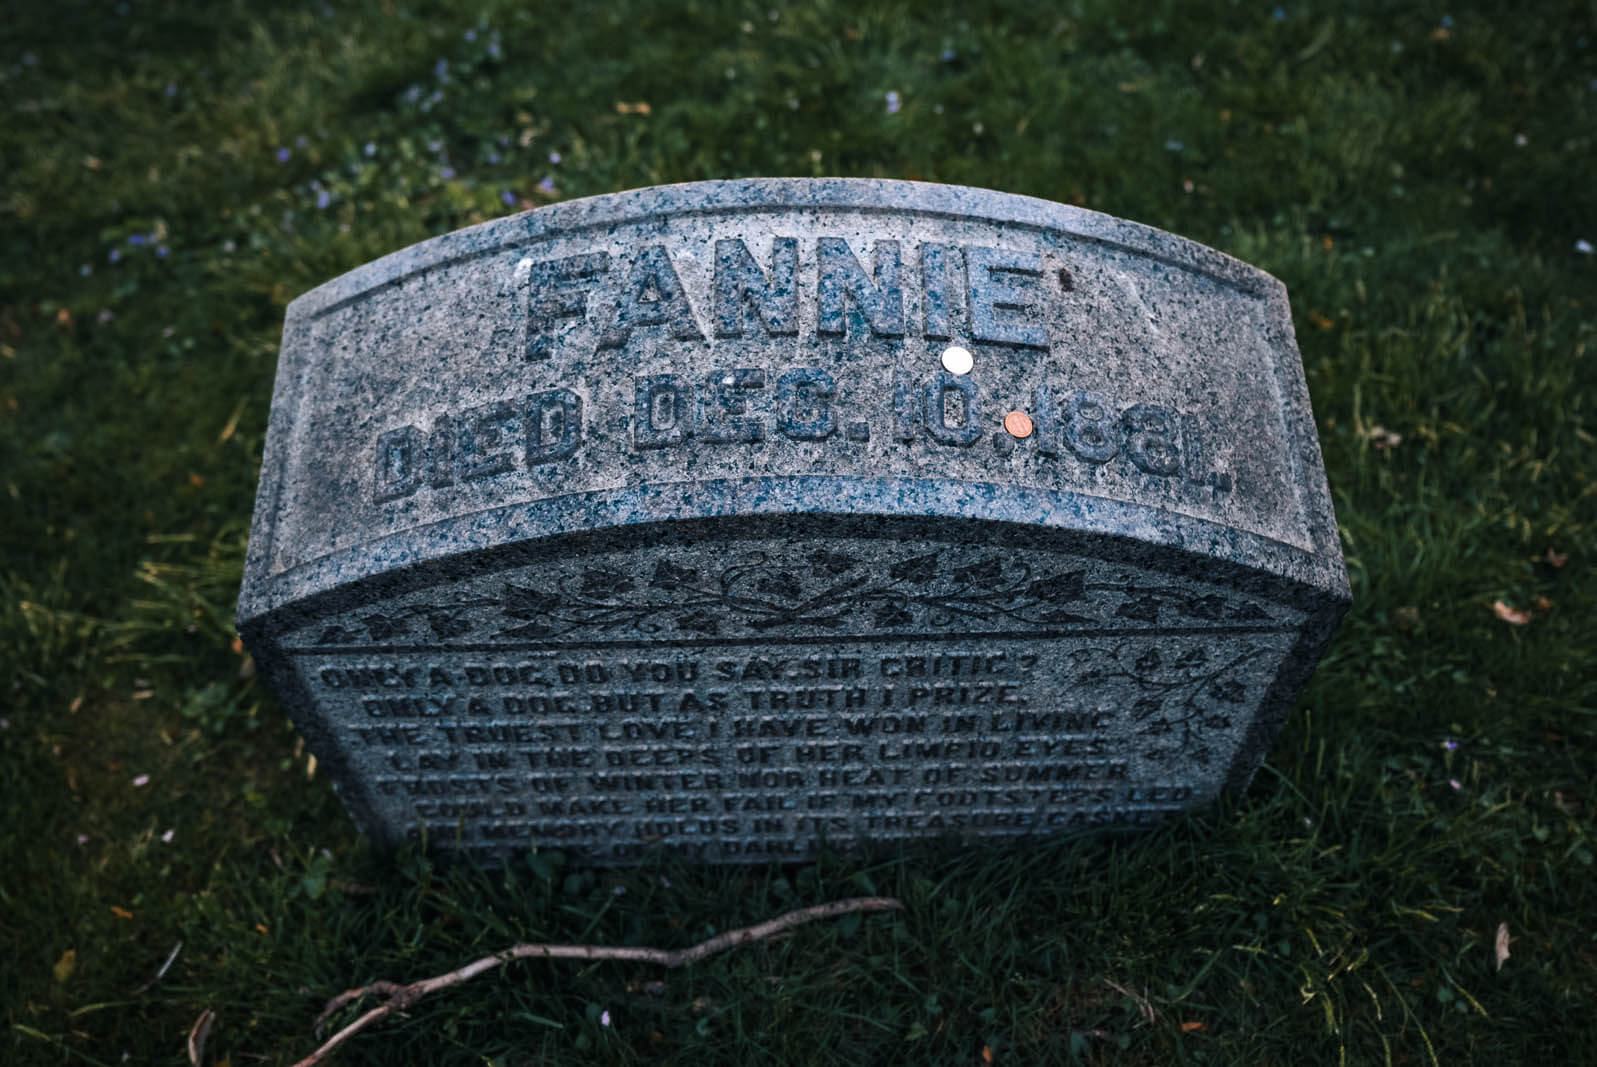 Fannie the dog gravestone at Greenwood cemetery in Brooklyn